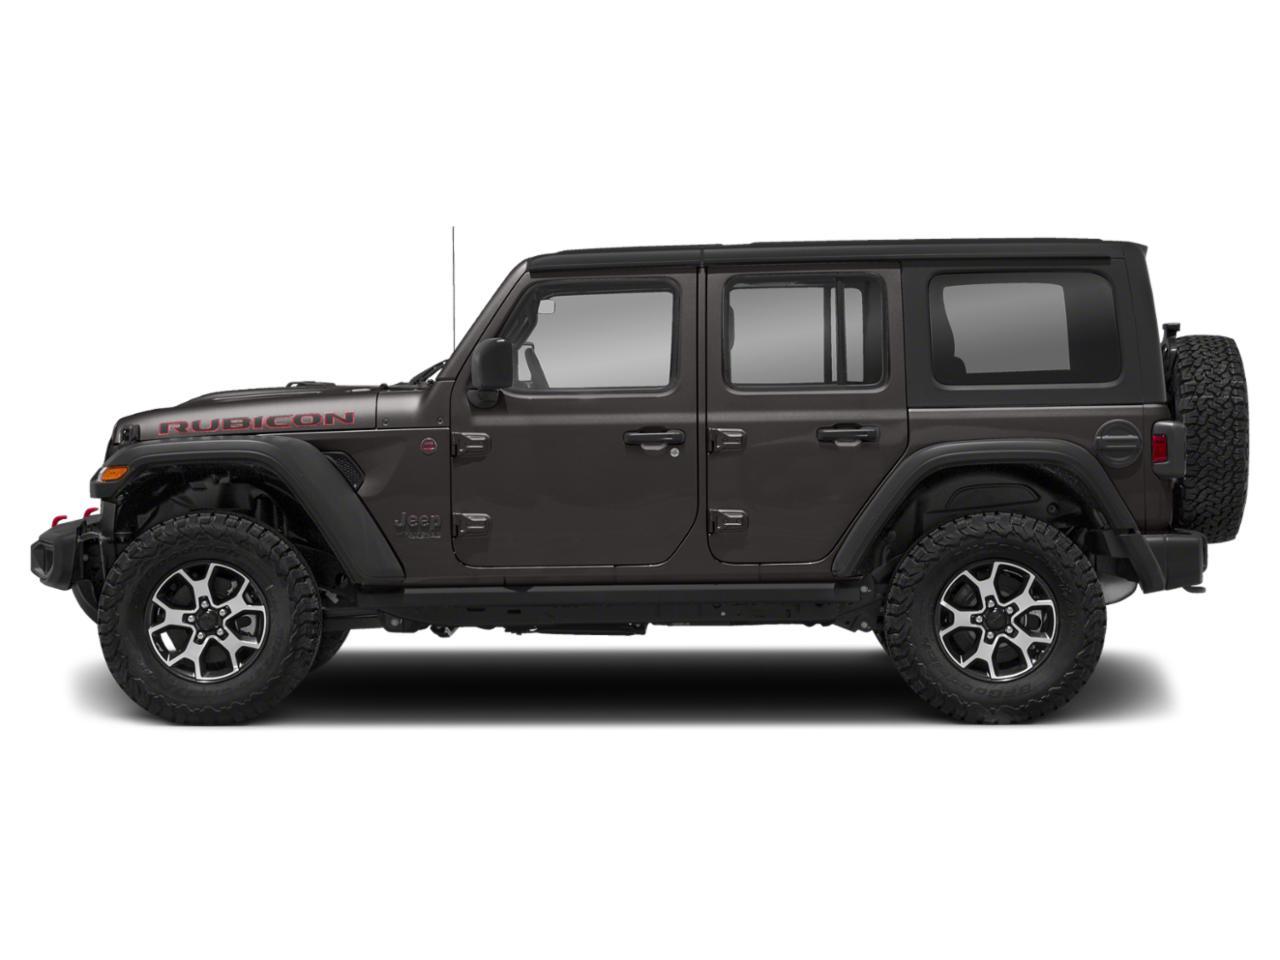 Texarkana Granite Crystal Metallic Clearcoat 2020 Jeep Wrangler Unlimited Used Near Me P2185